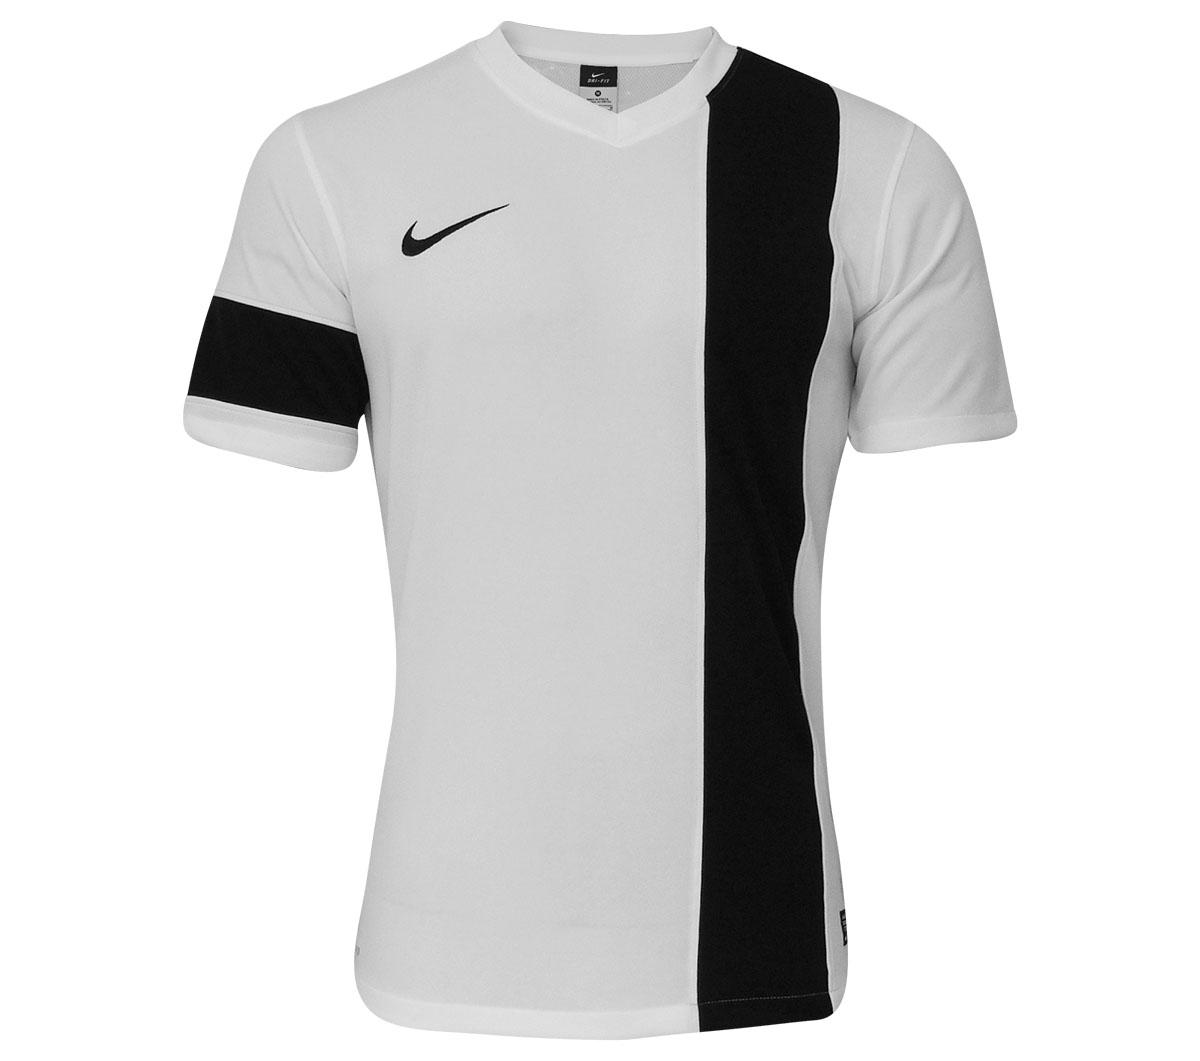 Camisa Nike SS Striker III Branca e Preta - Mundo do Futebol 5fe46eb020b28